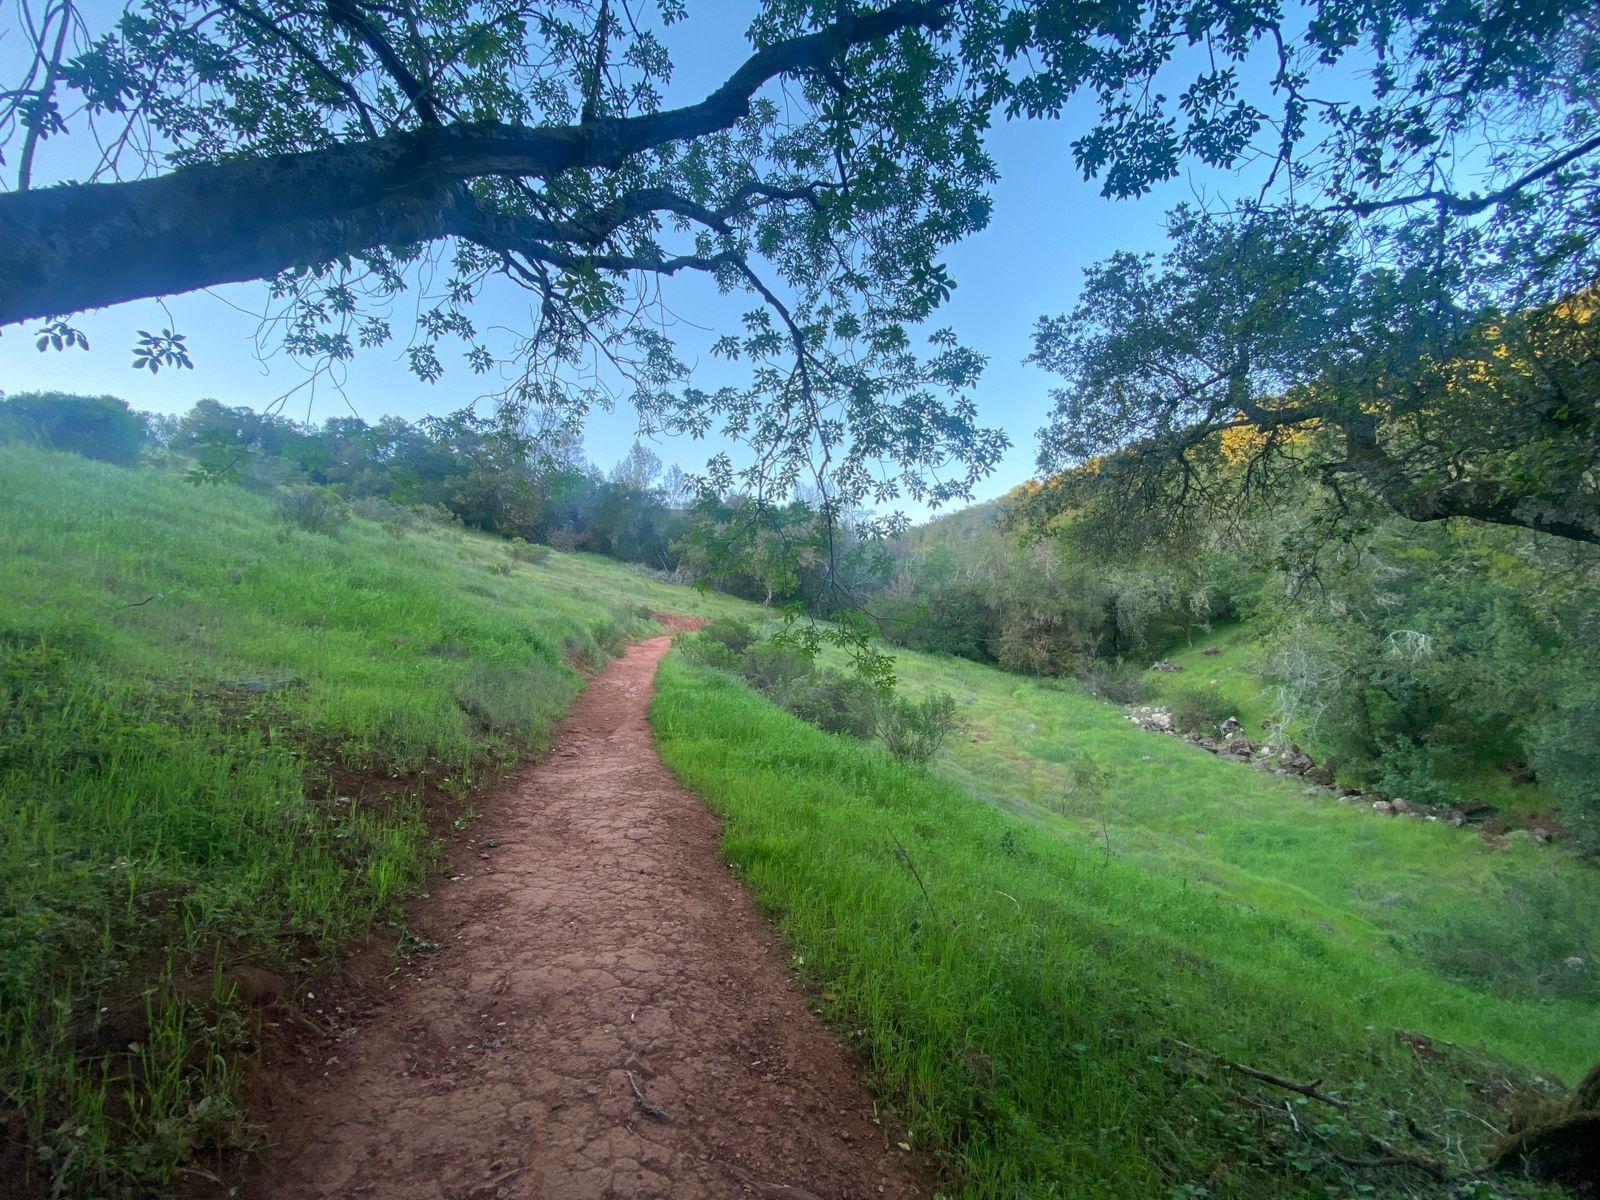 Overlook Trail, Sonoma. California